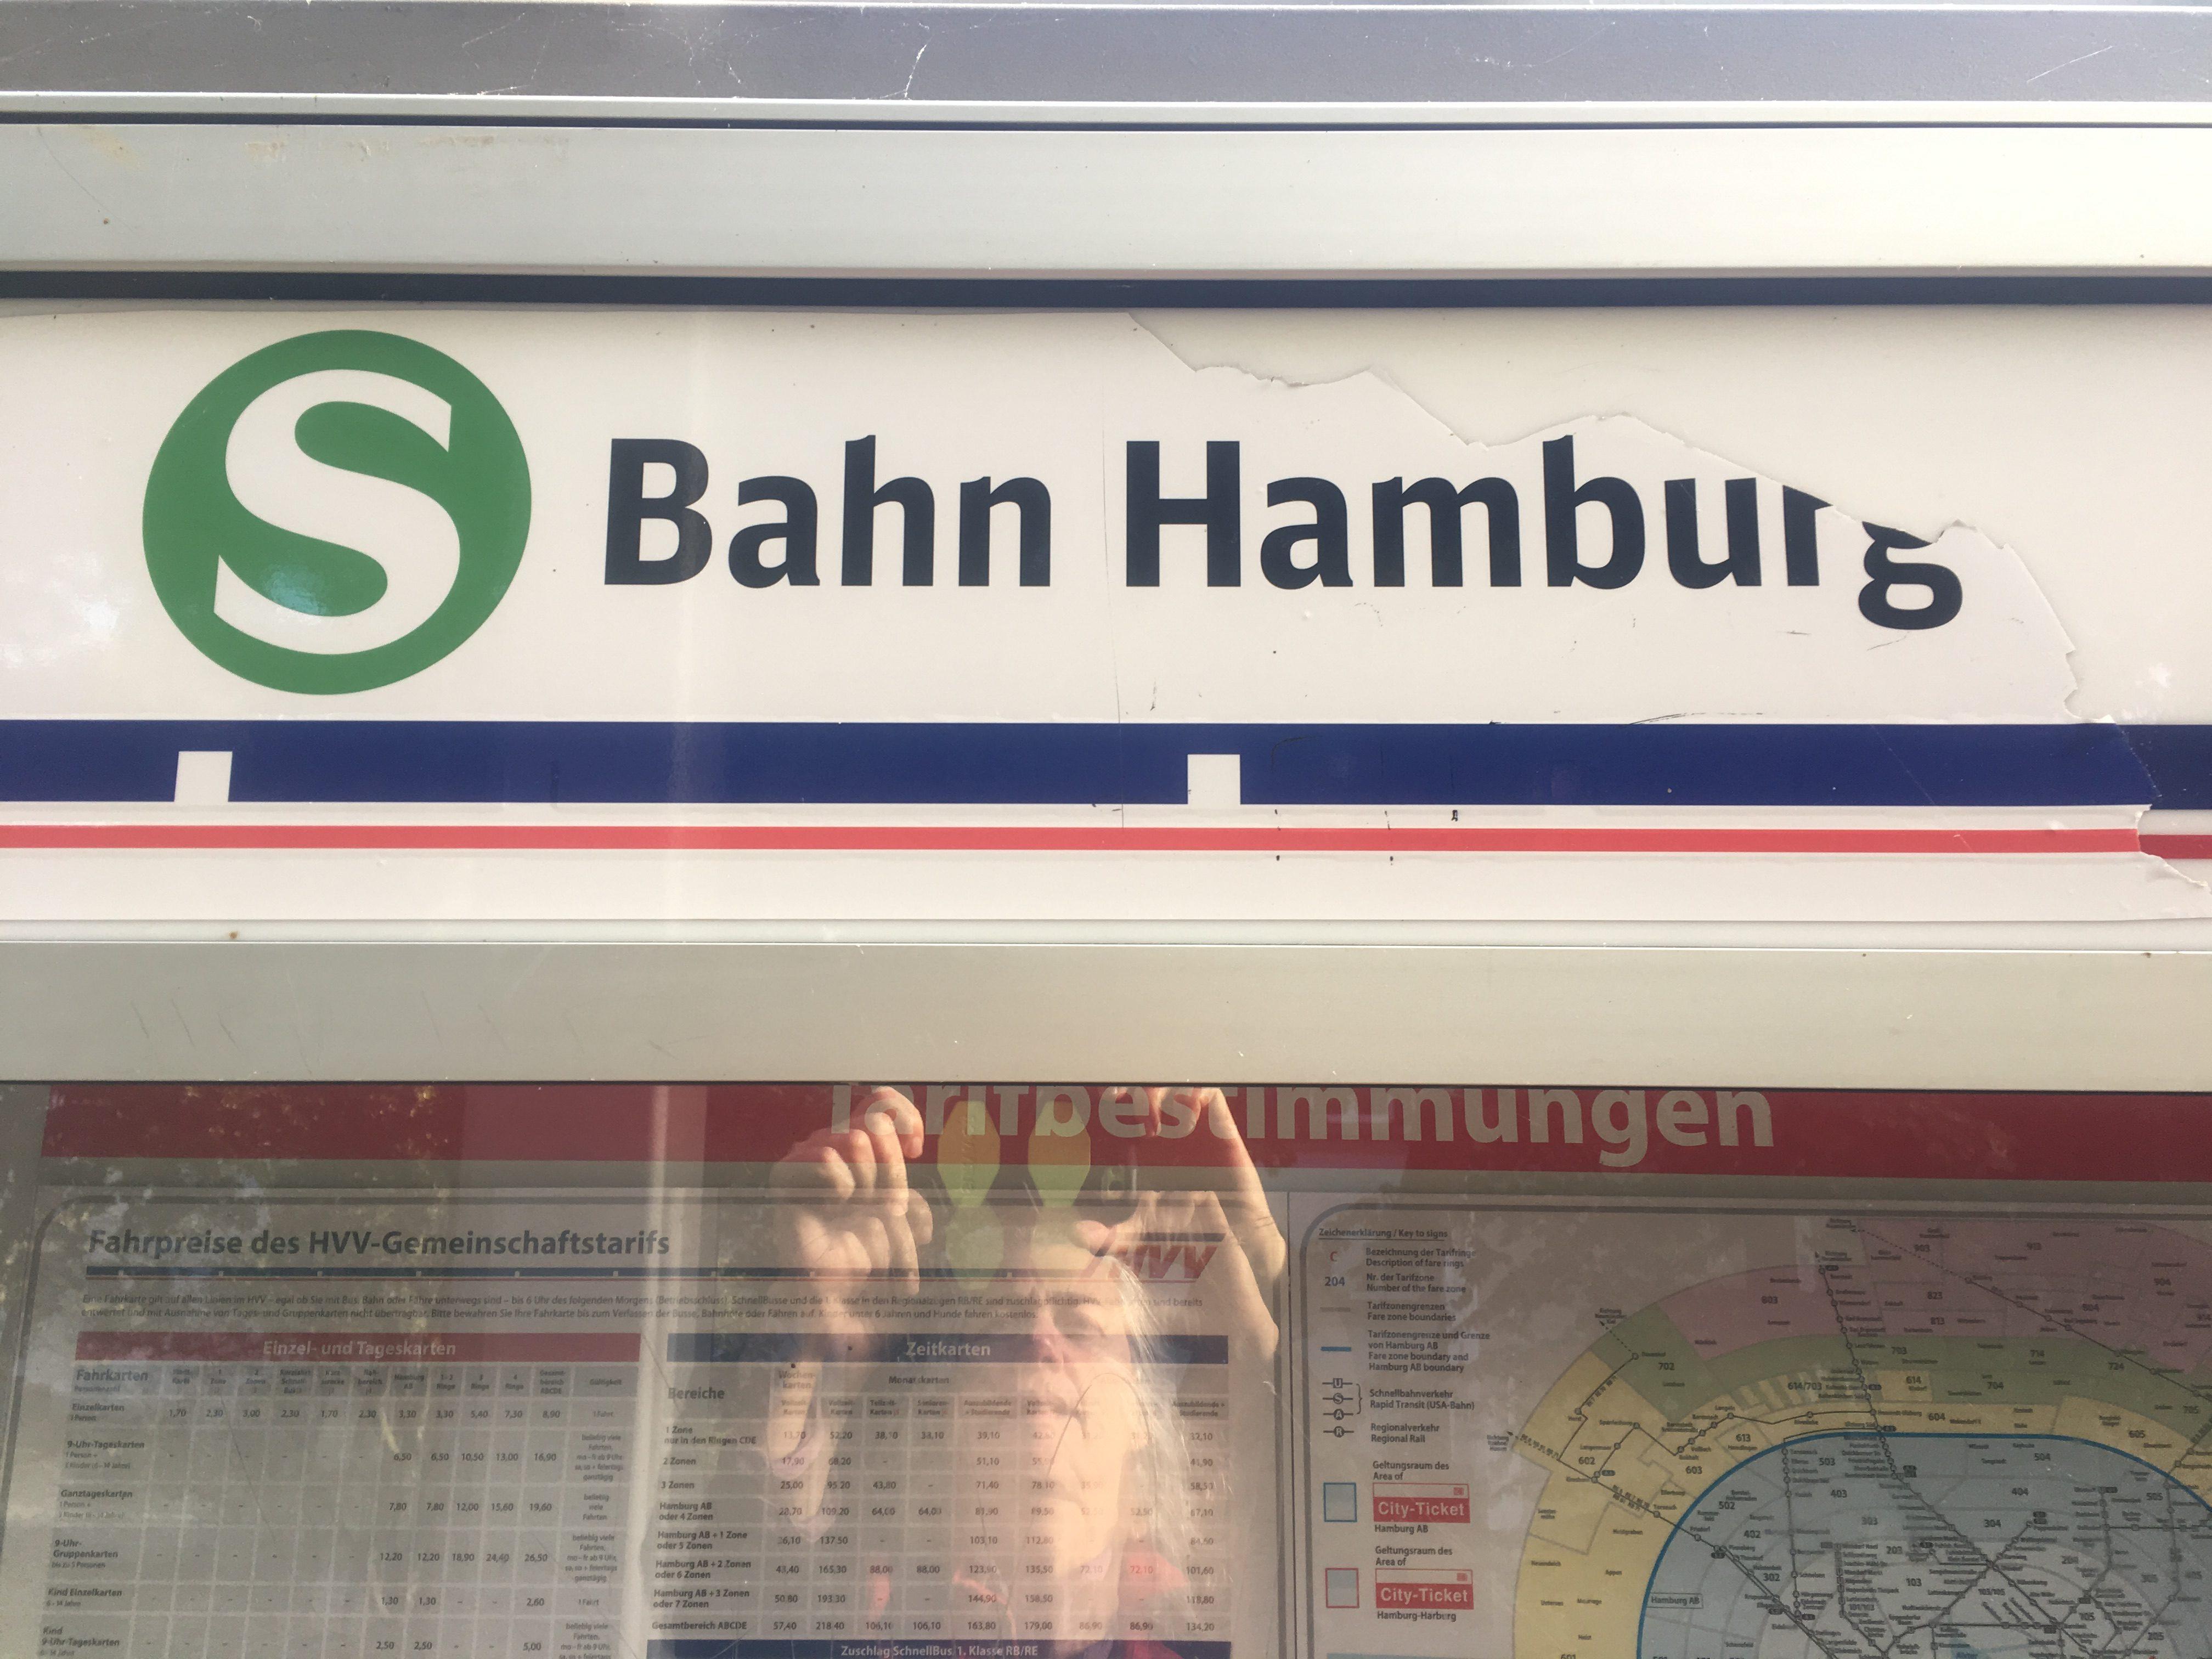 S Bahn Hamburg where i am